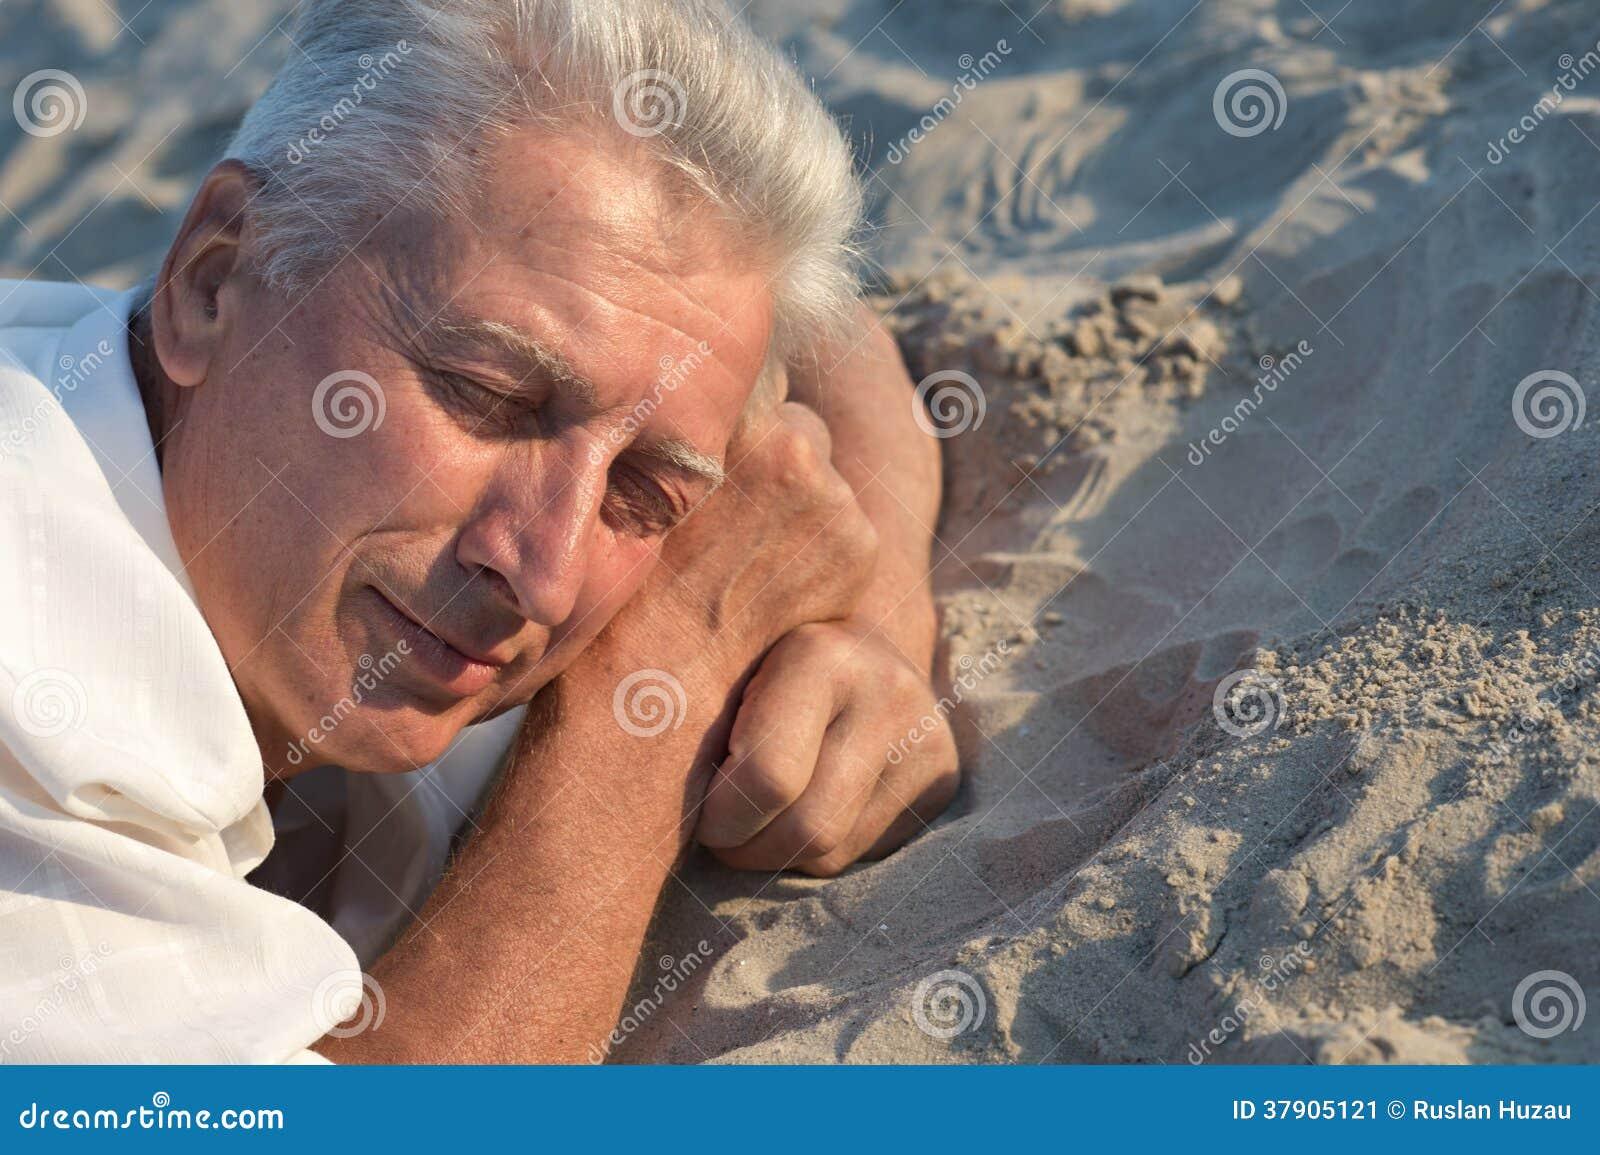 Closeup Of Man Sleeping On The Beach Royalty Free Stock